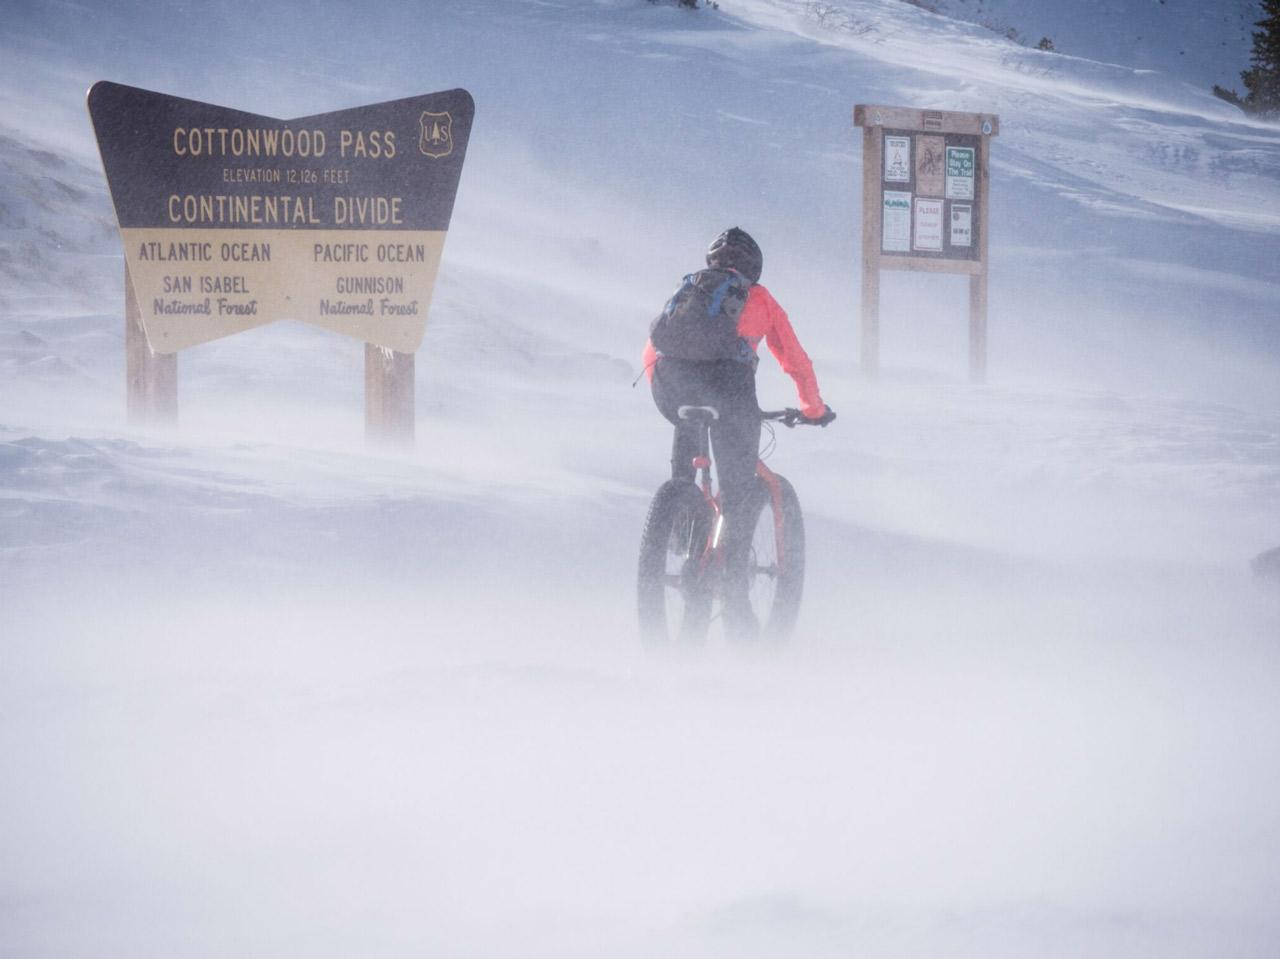 RBR_cottonwood-pass-summit_01